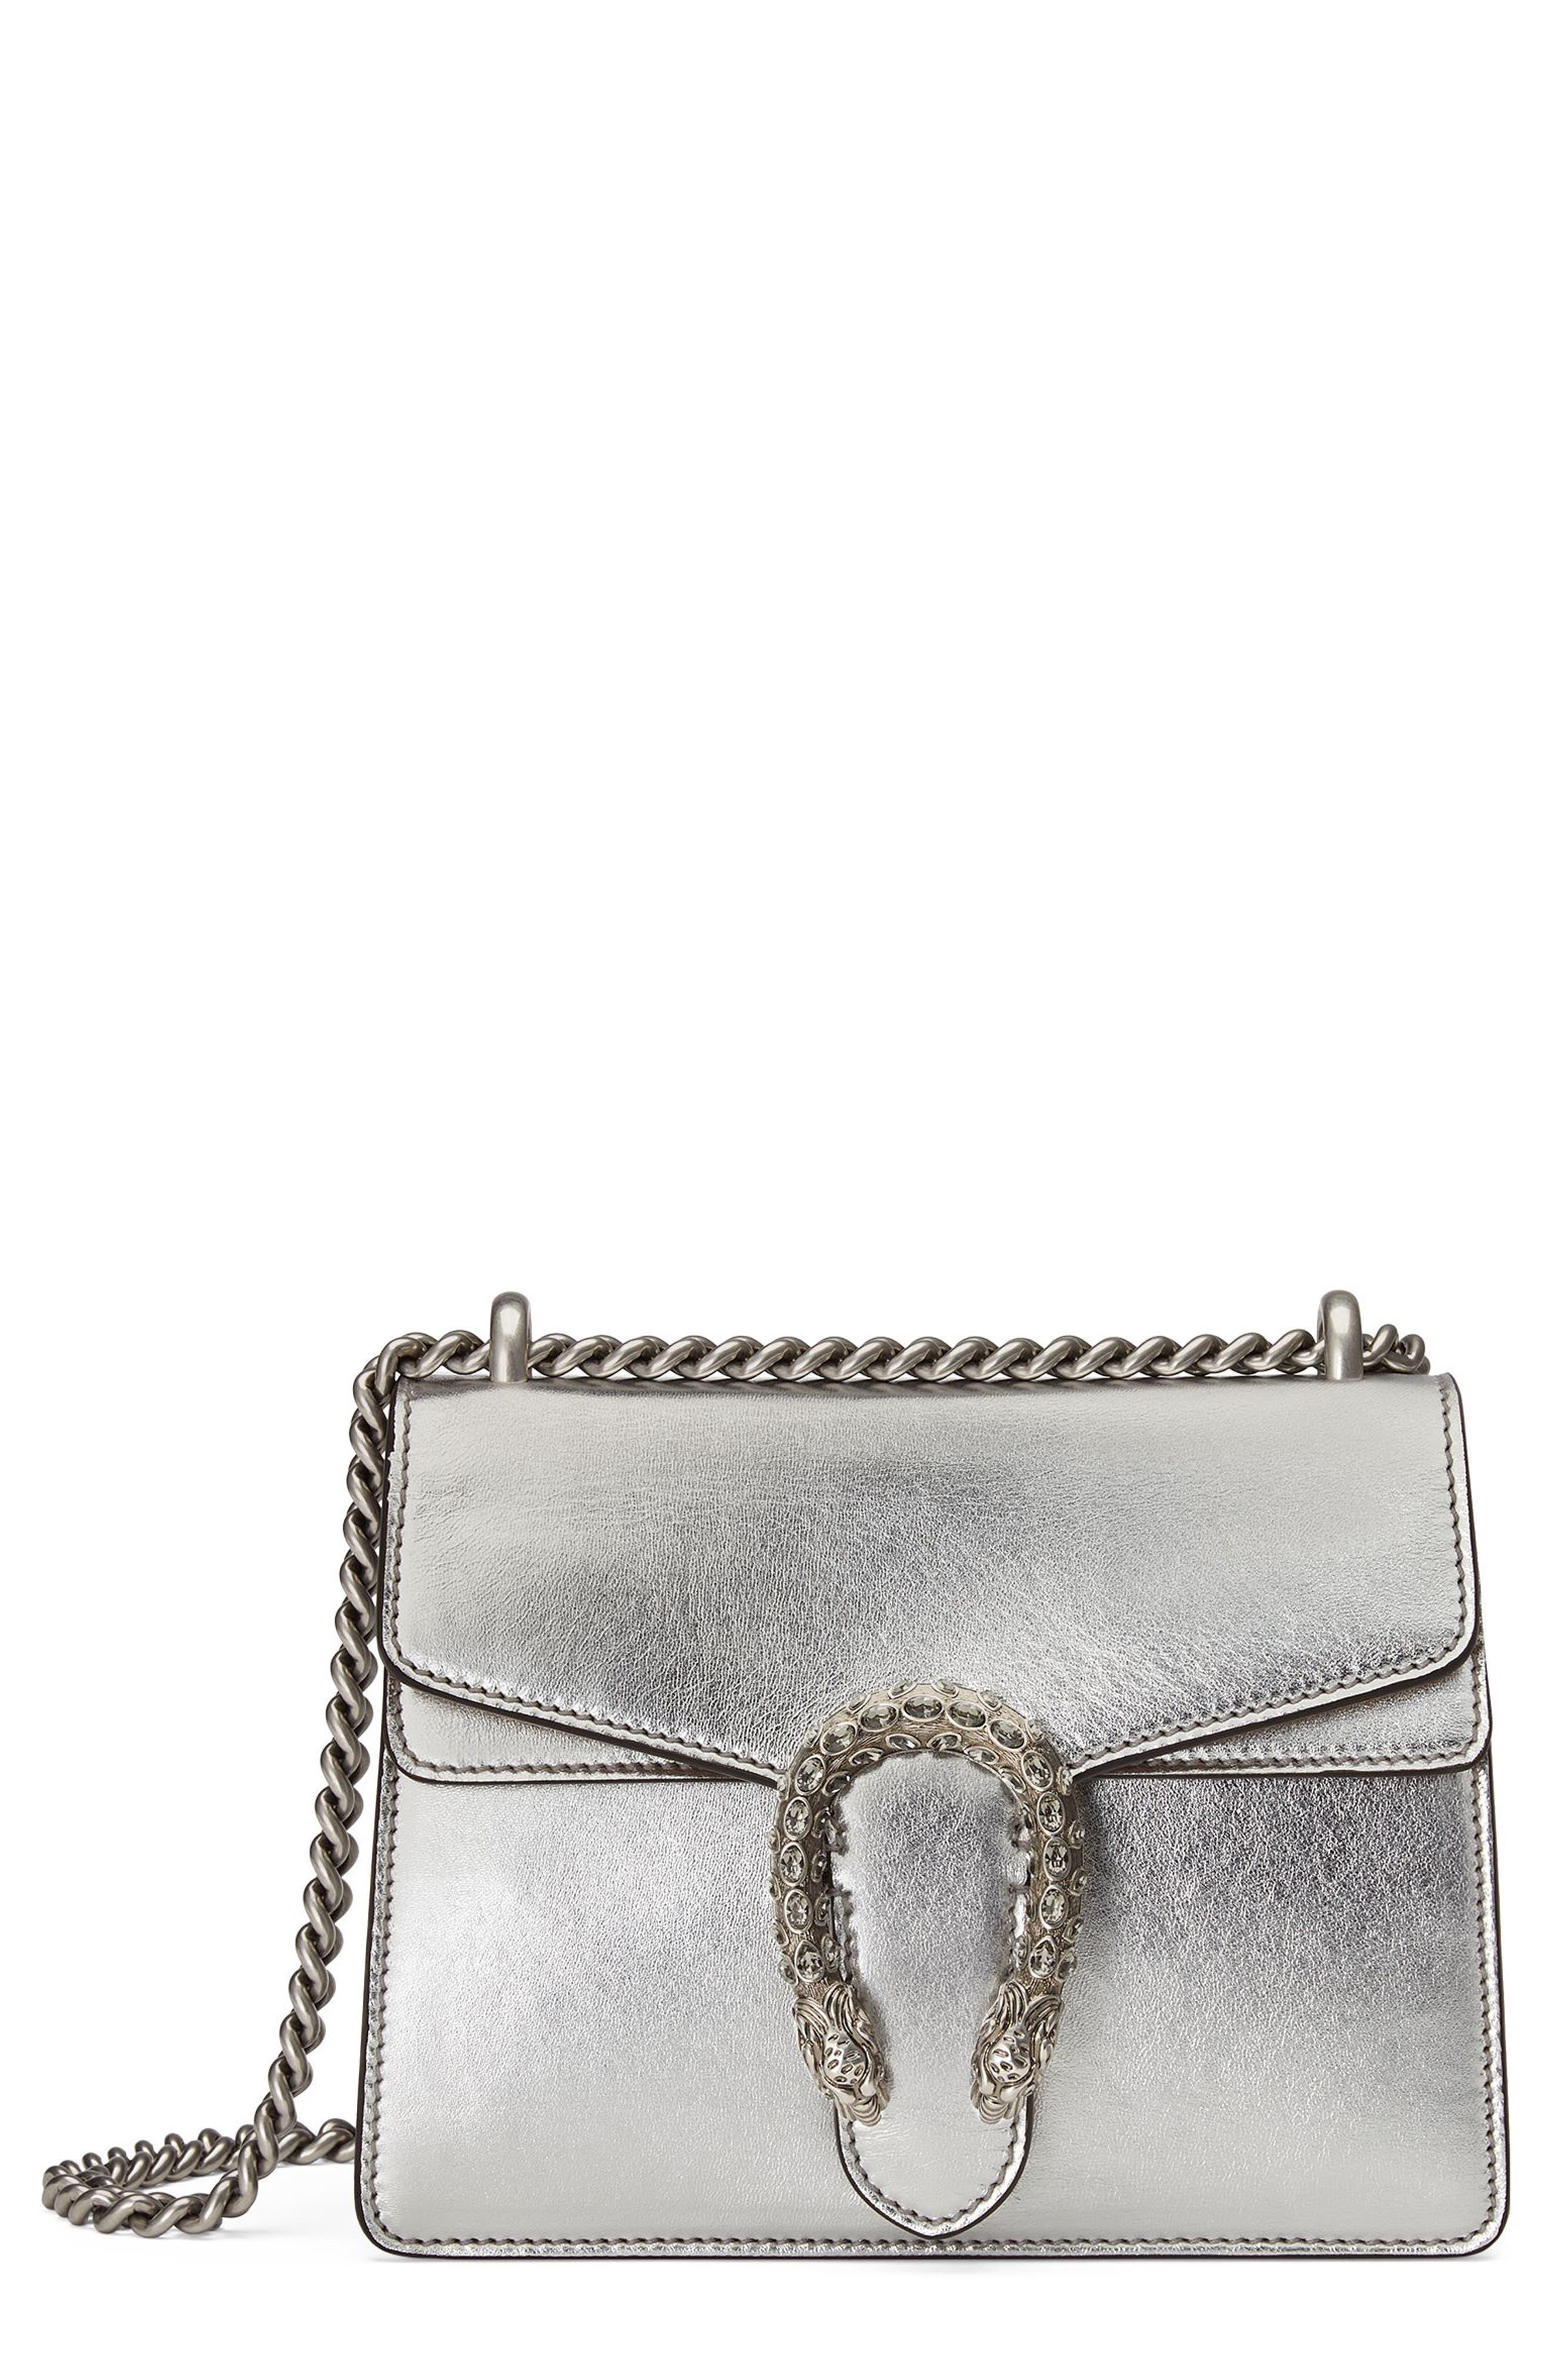 GUCCI Mini Dionysus Metallic Leather Shoulder Bag